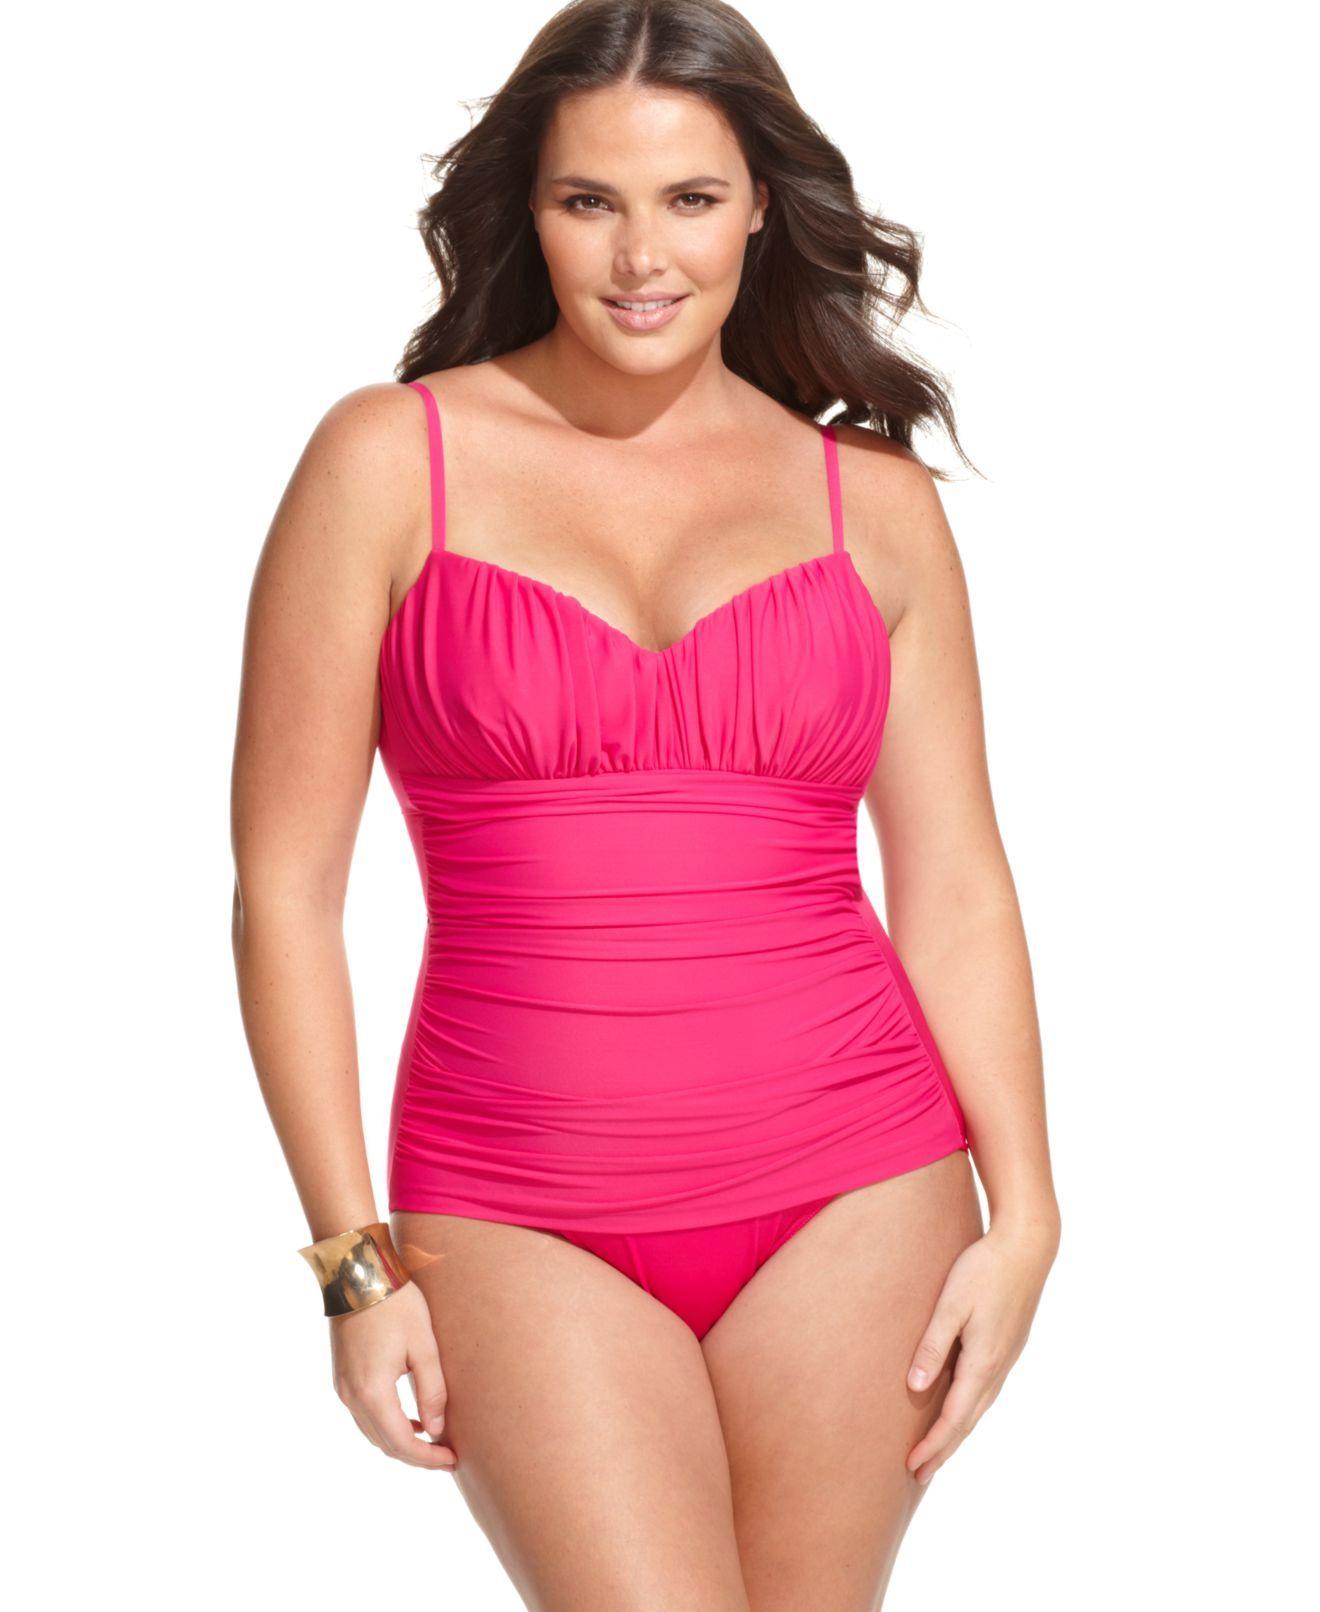 miraclesuit plus size swimsuit, rialto ruched one piece - plus